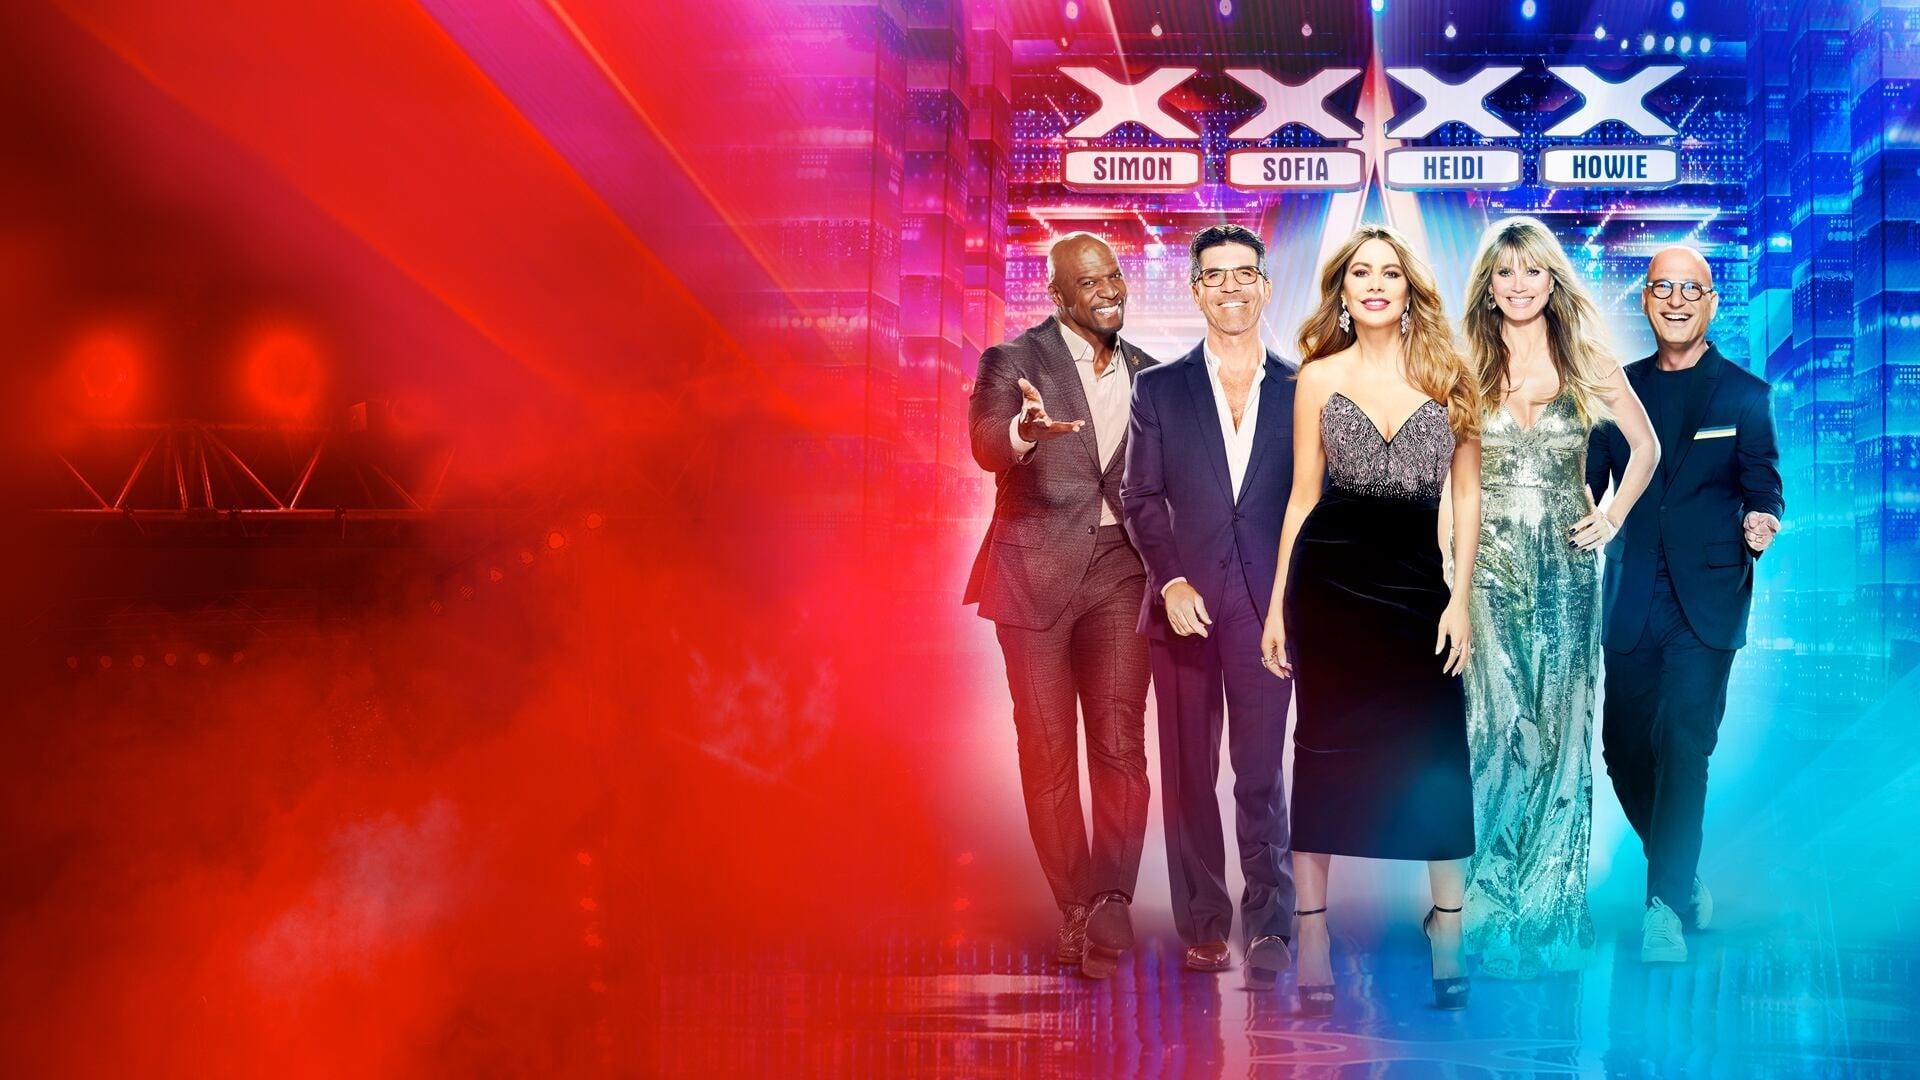 'AGT' 2020: America's Got Talent Season 15 Episode 19 Semi-Finals 1 (Archie Williams)